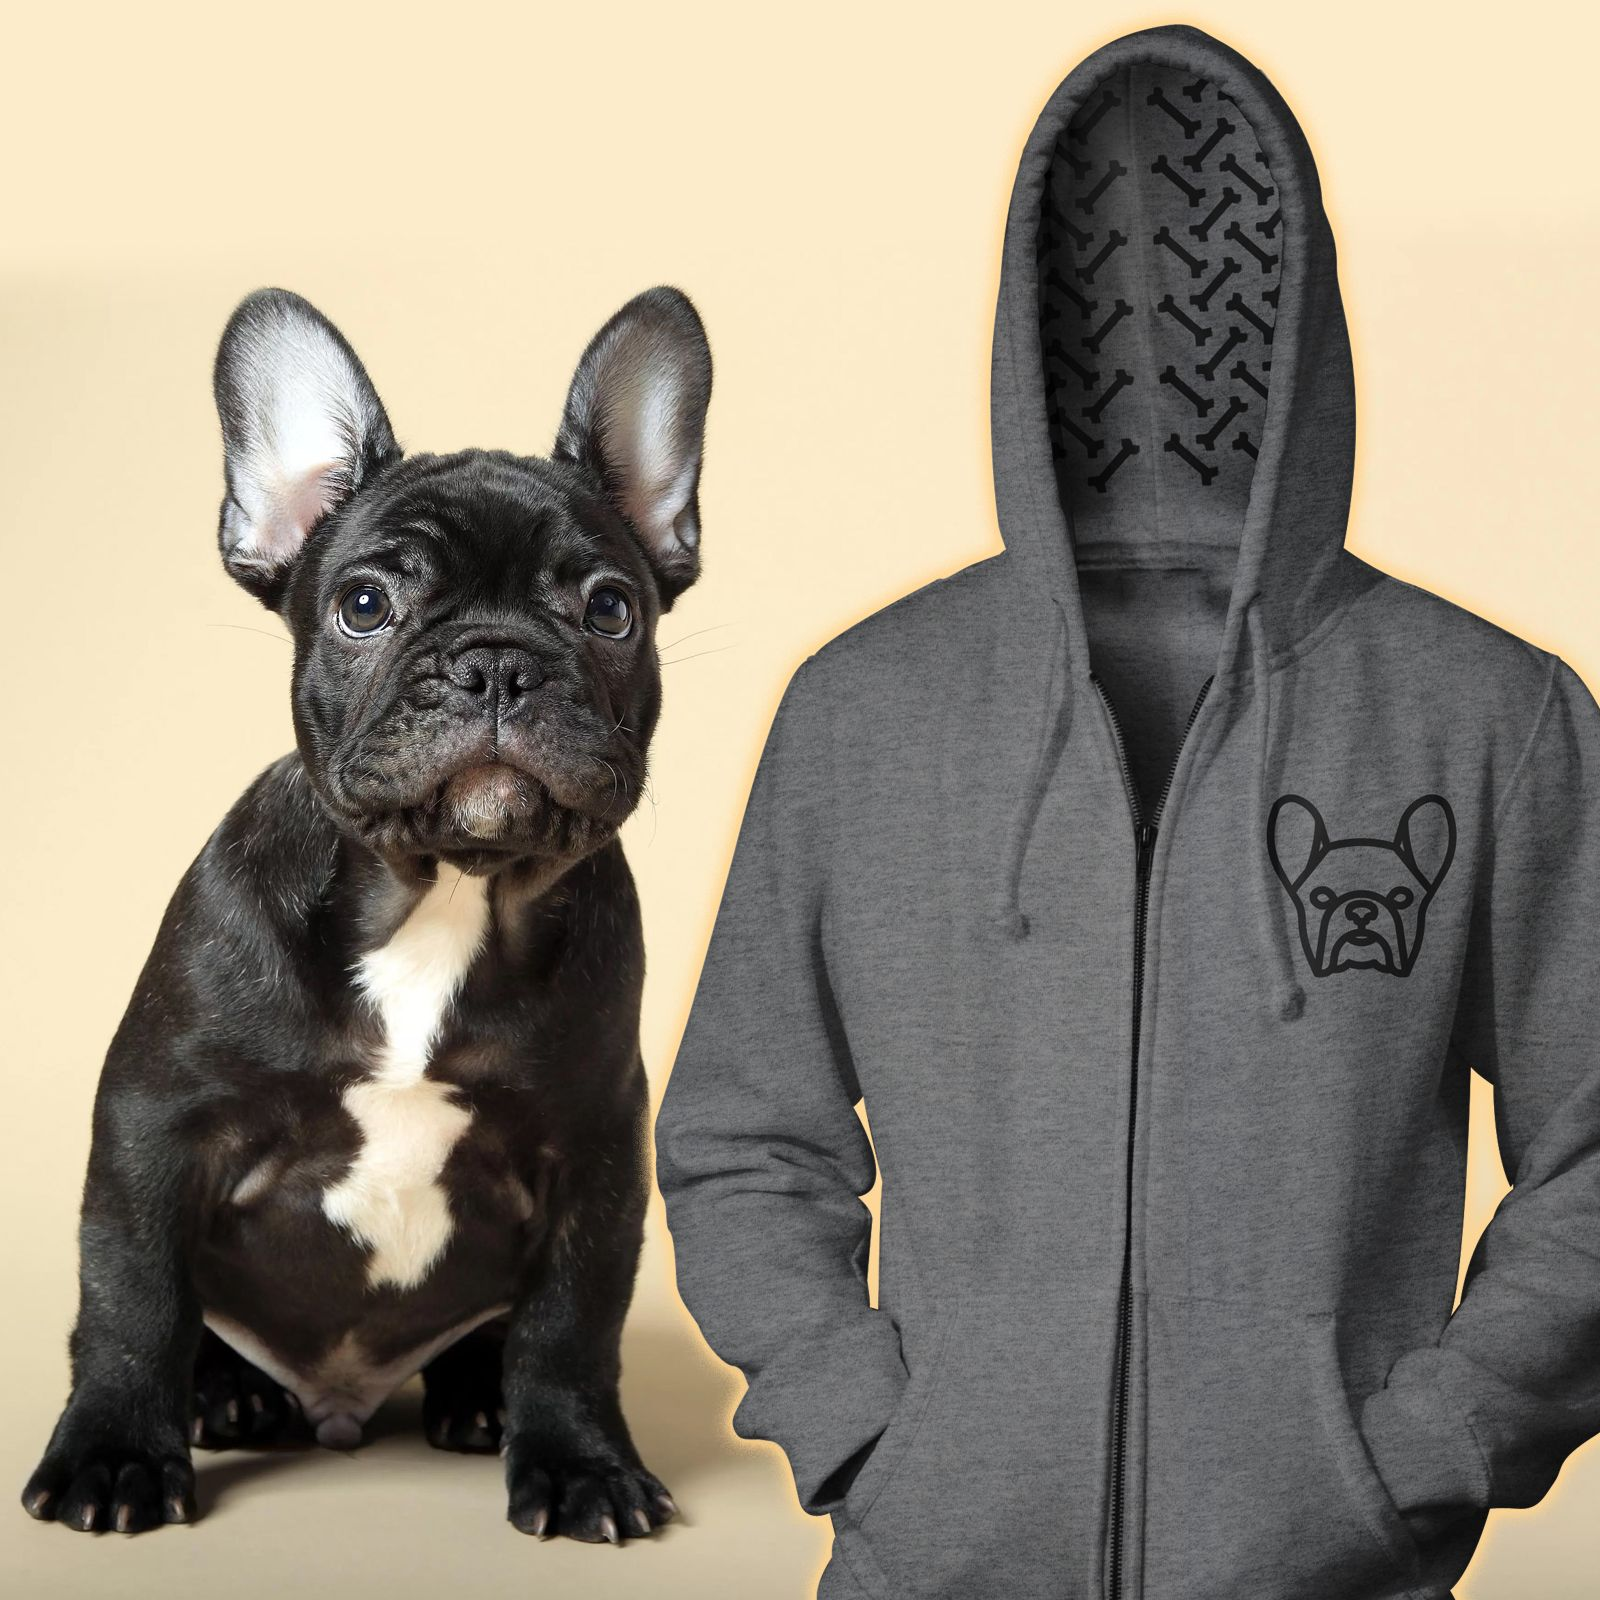 French Bulldog Hoodie Bones In the Hood. Great gift